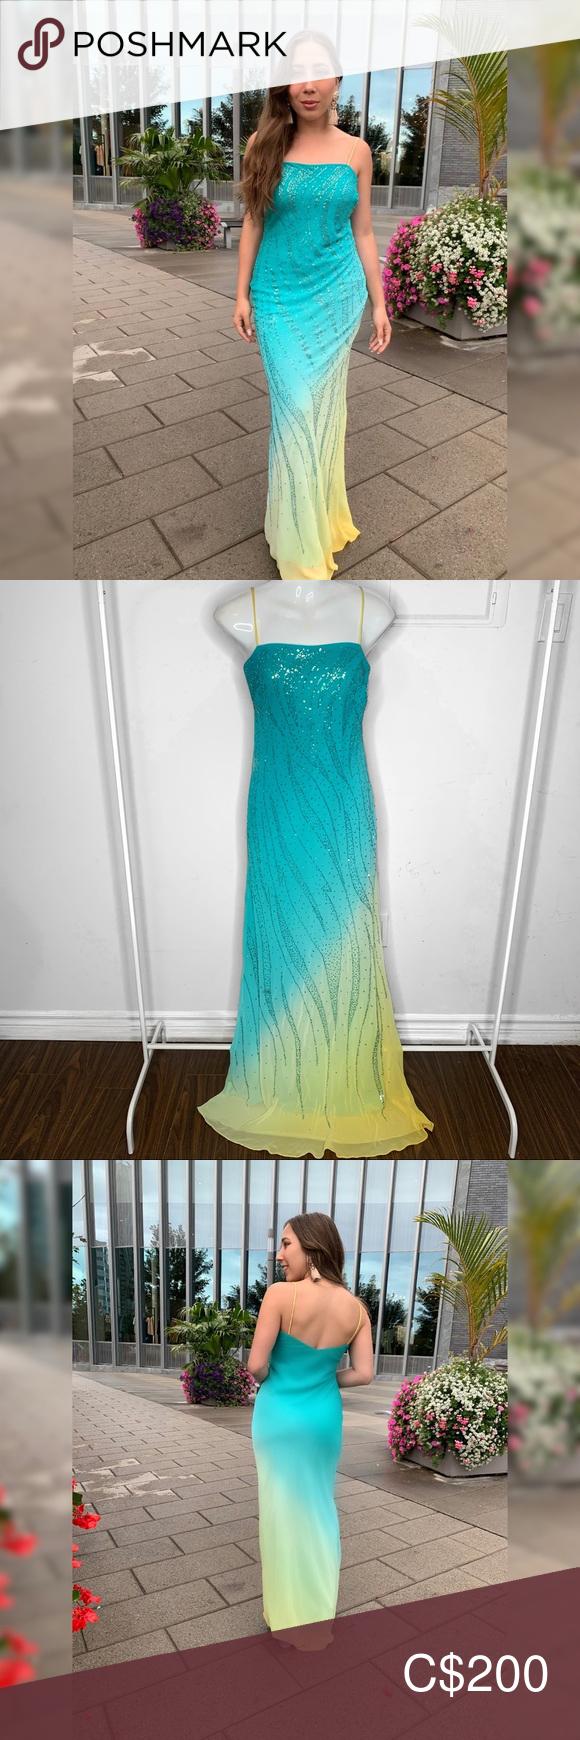 Nwt Ombre Wedding Dress Gown Dress Bridesmaid Ombre Wedding Dress Gowns Dresses Bridesmaid Outfit [ 1740 x 580 Pixel ]